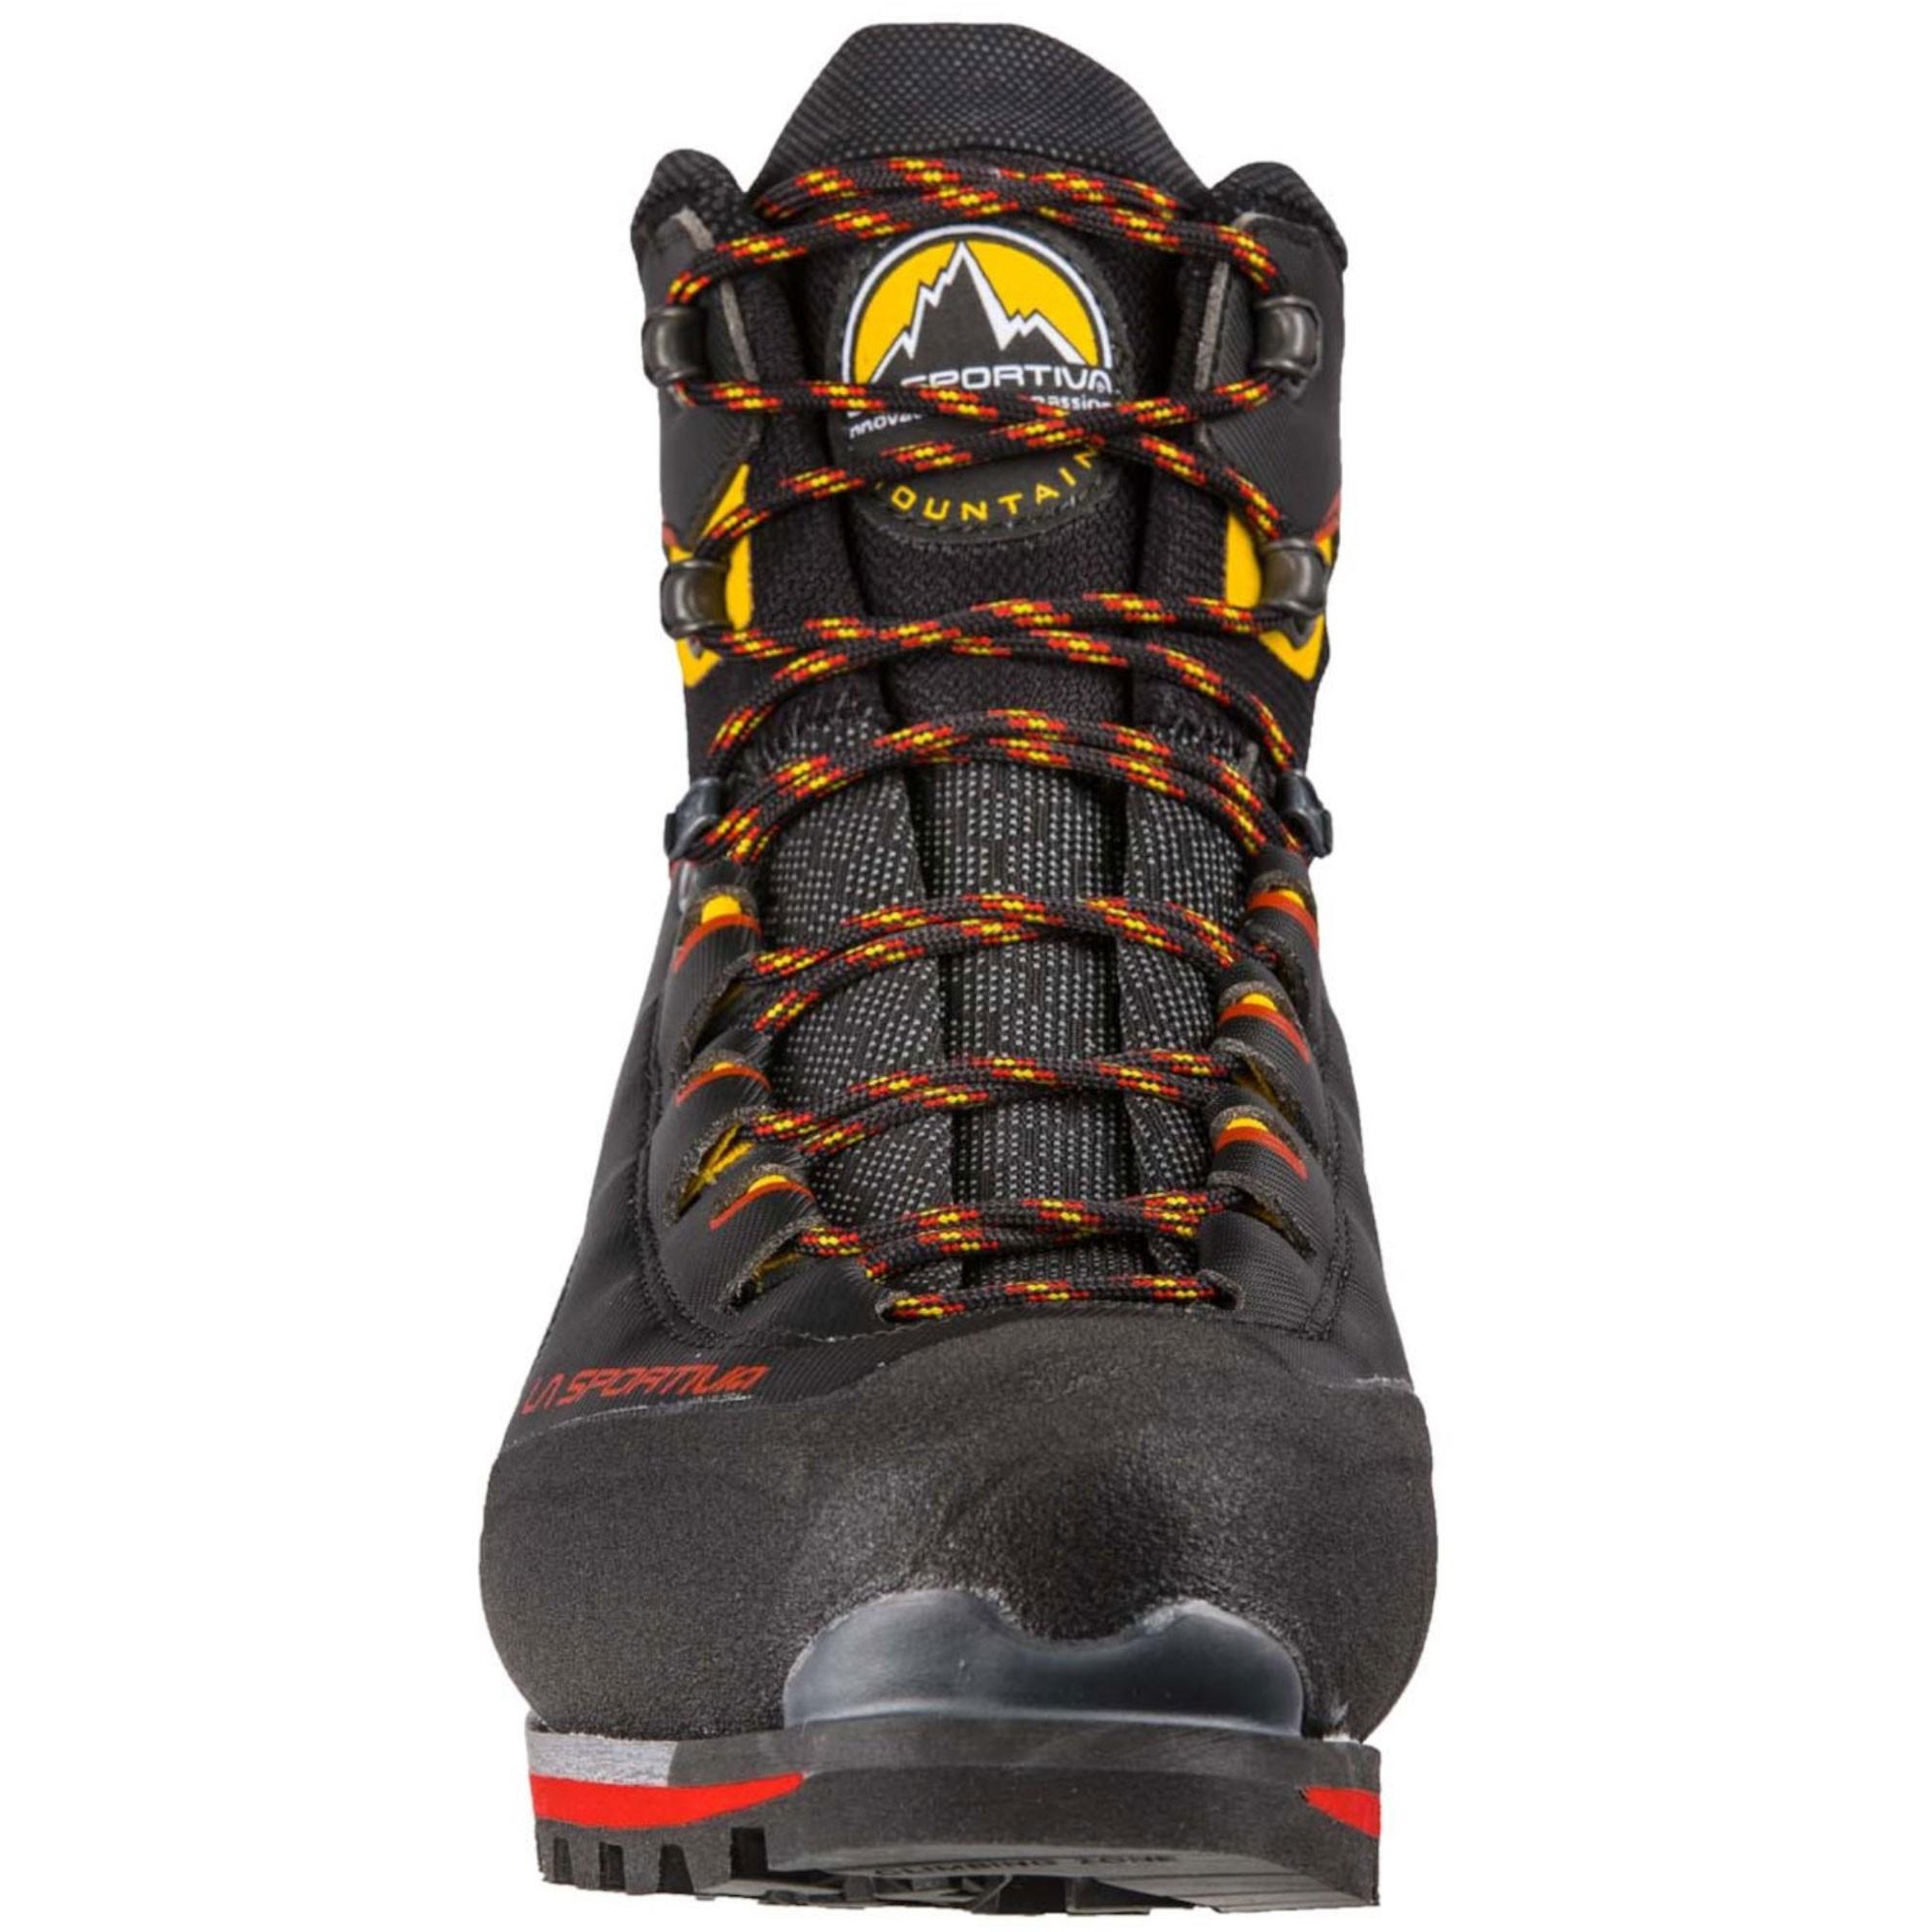 La Sportiva Men's Trango Tower Extreme GTX - Black/Yellow